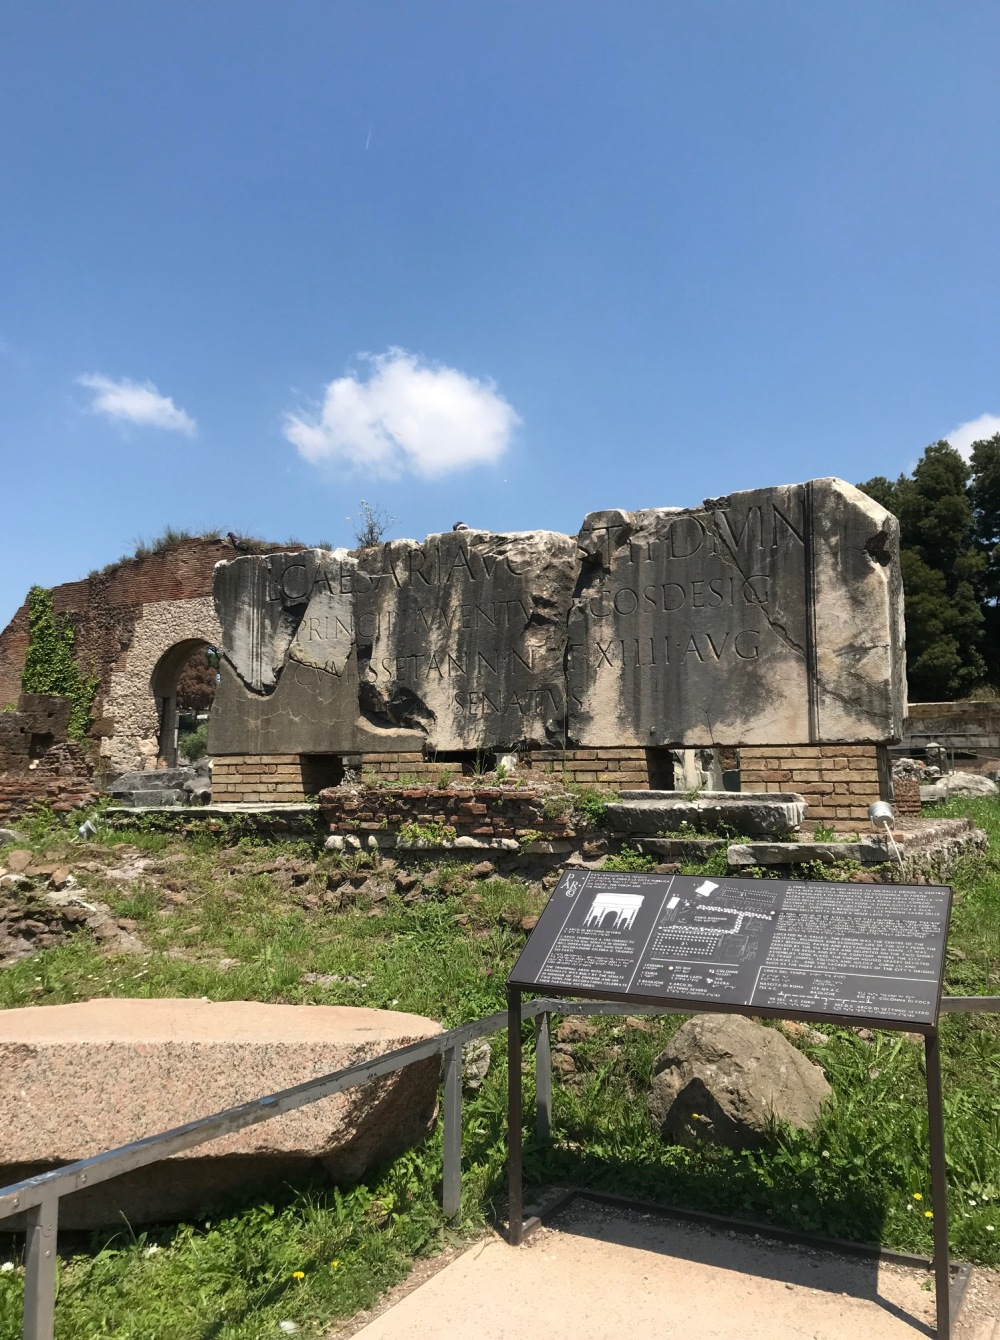 Primeiro impacto do Fórum Romano